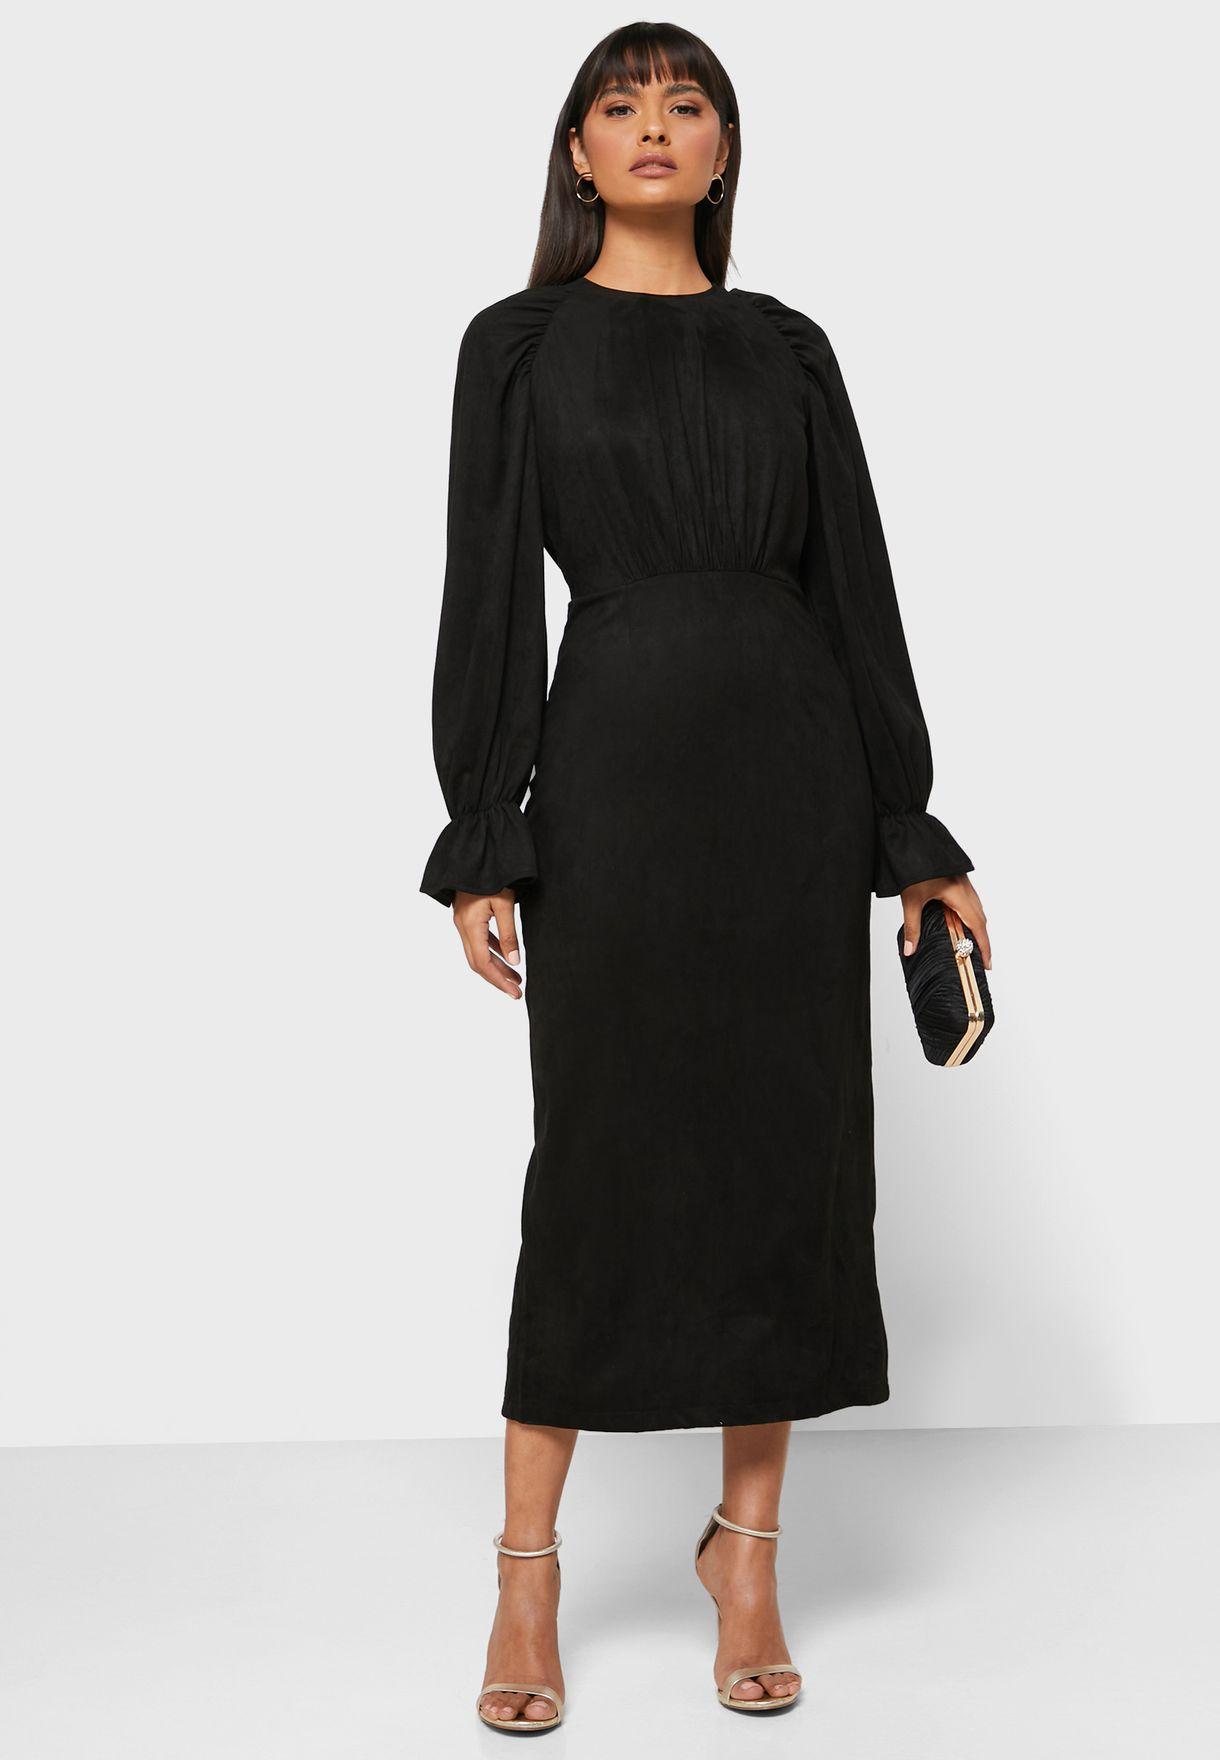 Statement Sleeve Midi Dress